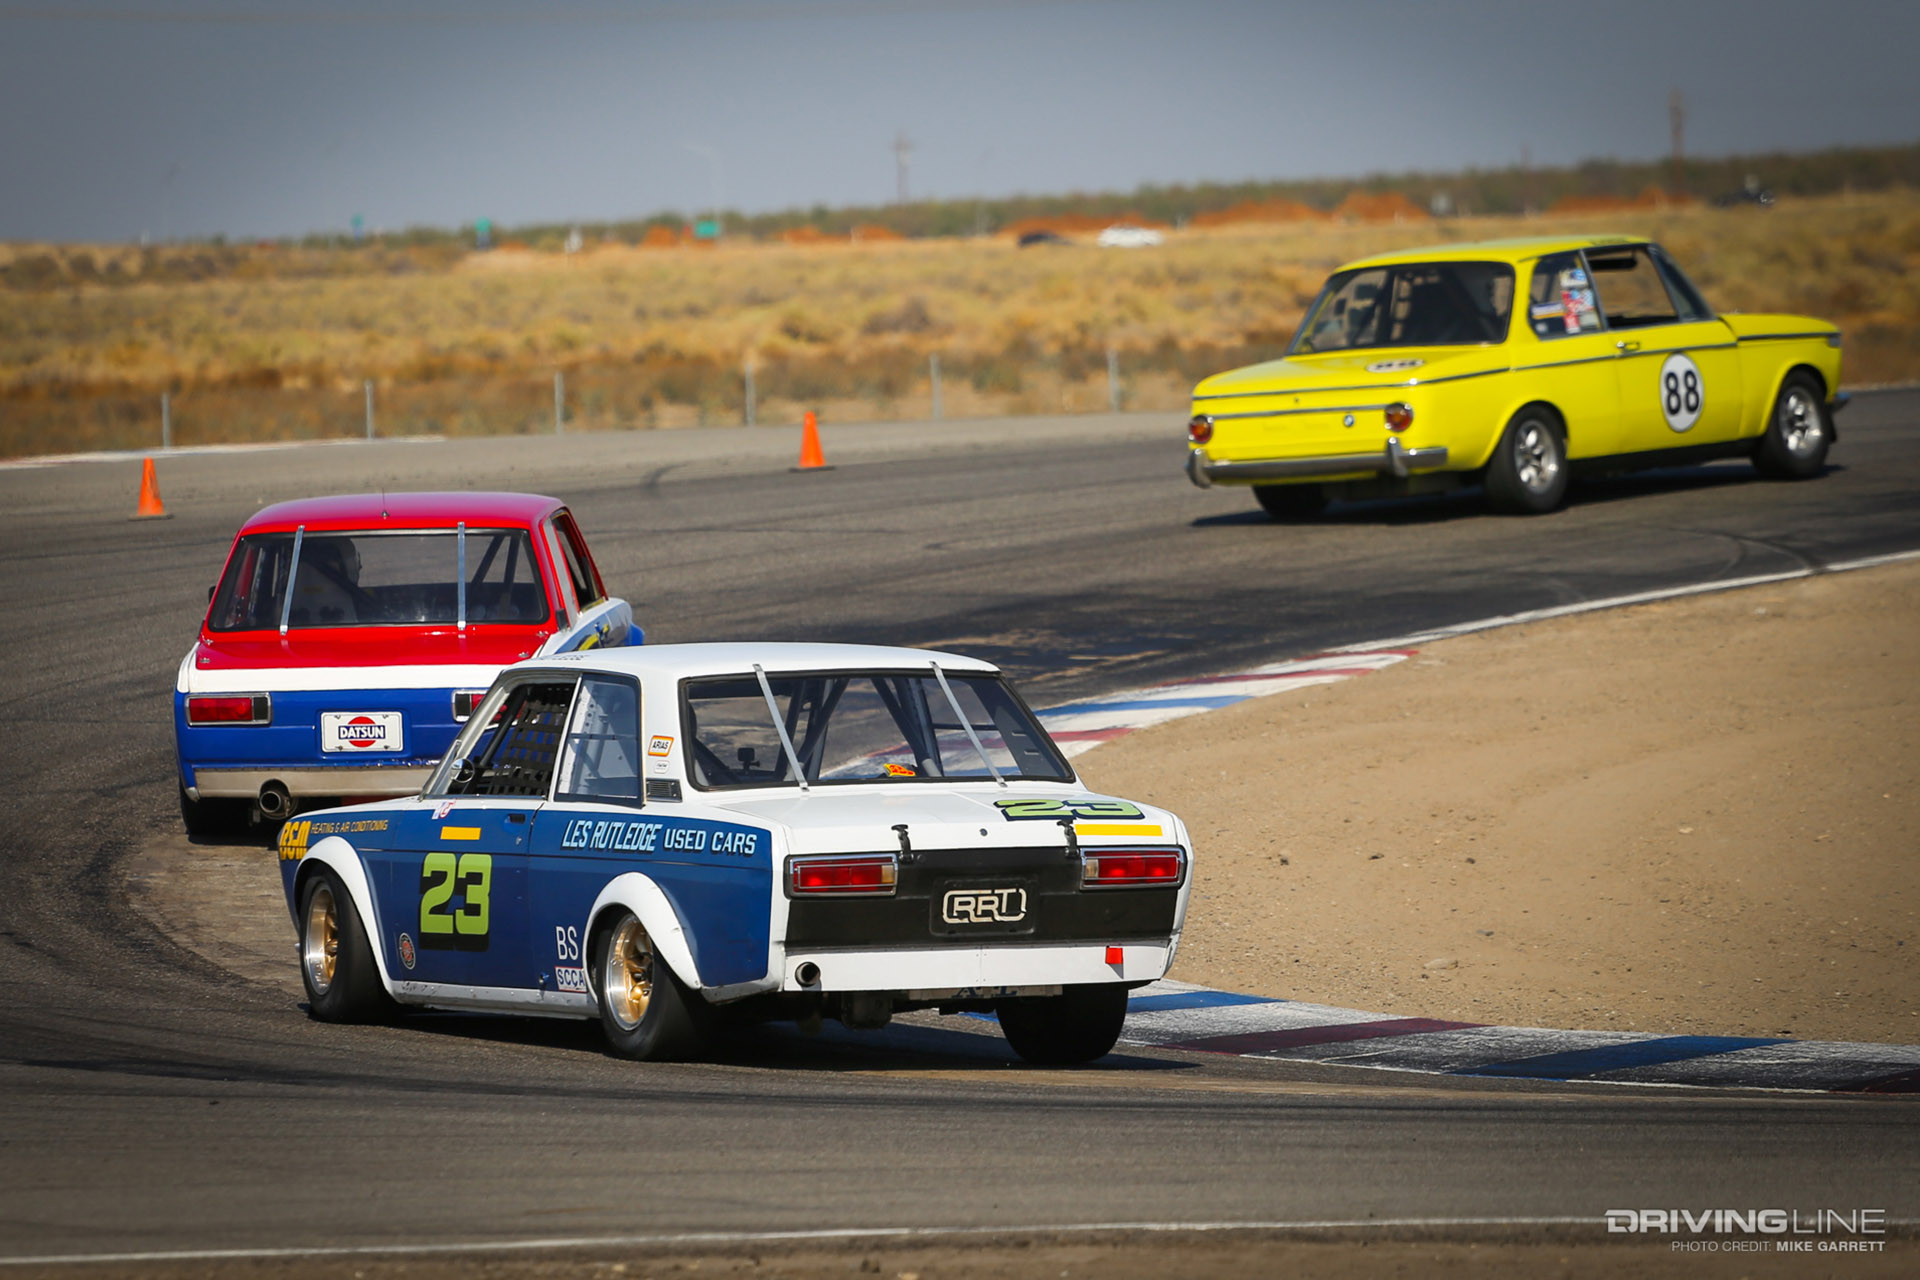 70s Time Warp: The Glory of B Sedan Racing | DrivingLine